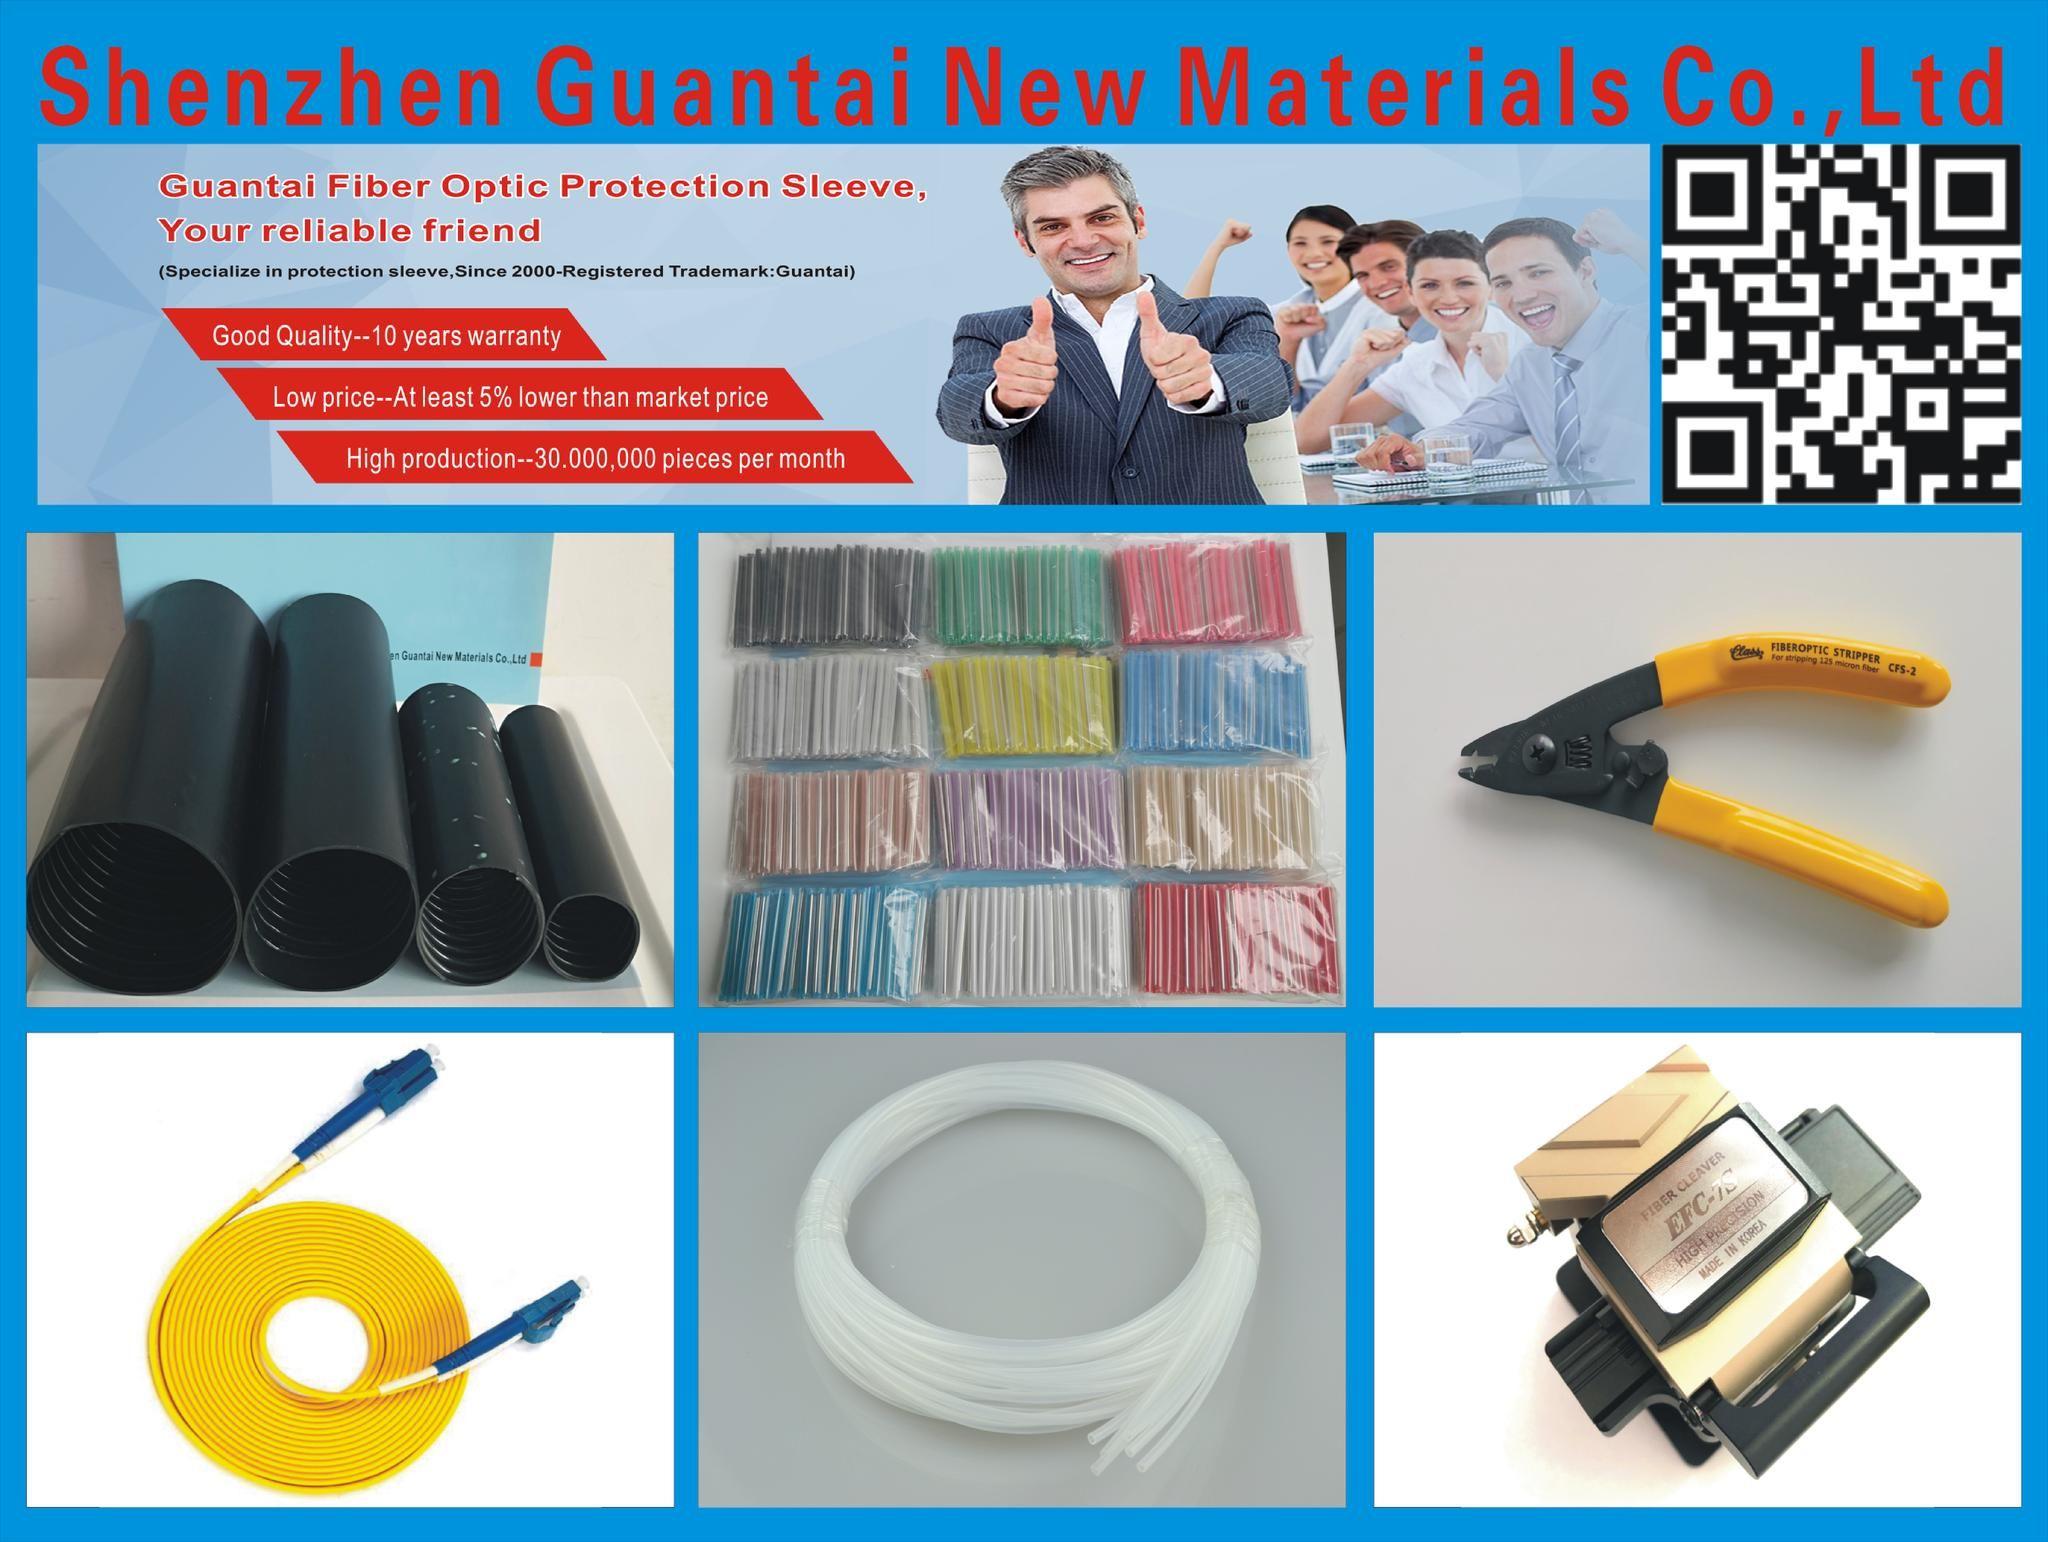 Shenzhen Guantai New Materials Co.,Ltd